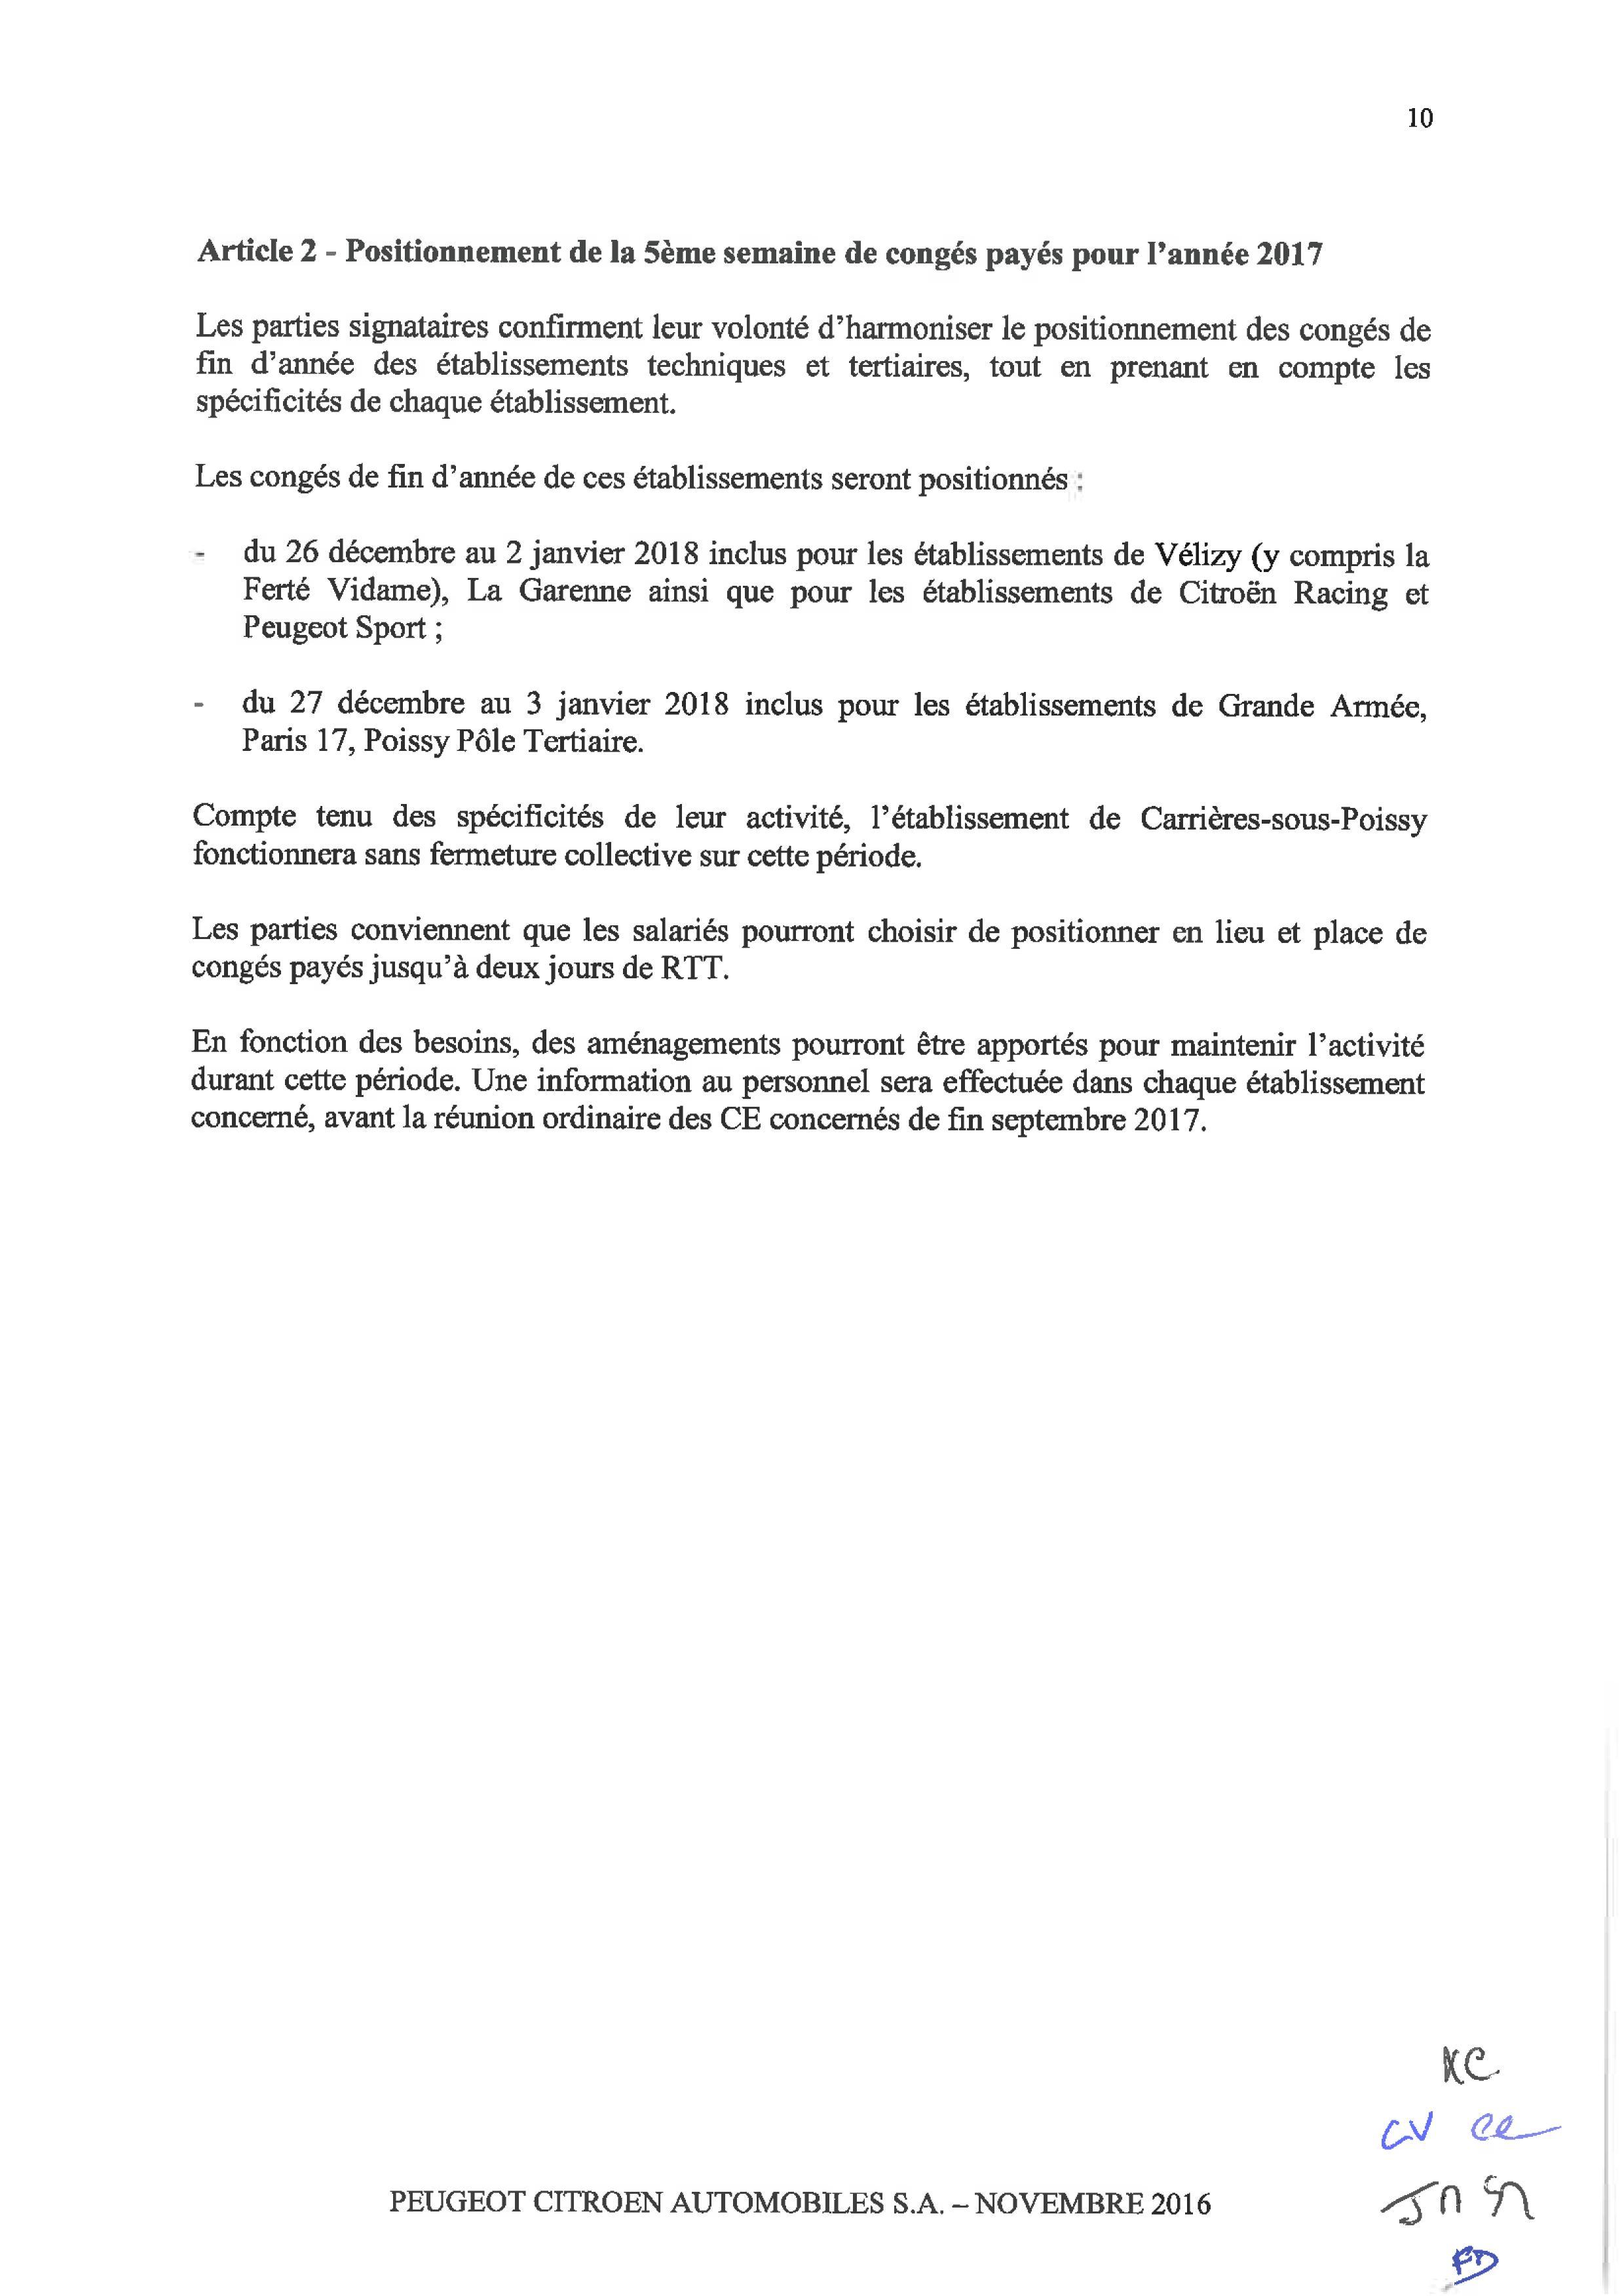 Accord centrale TT Congés_09